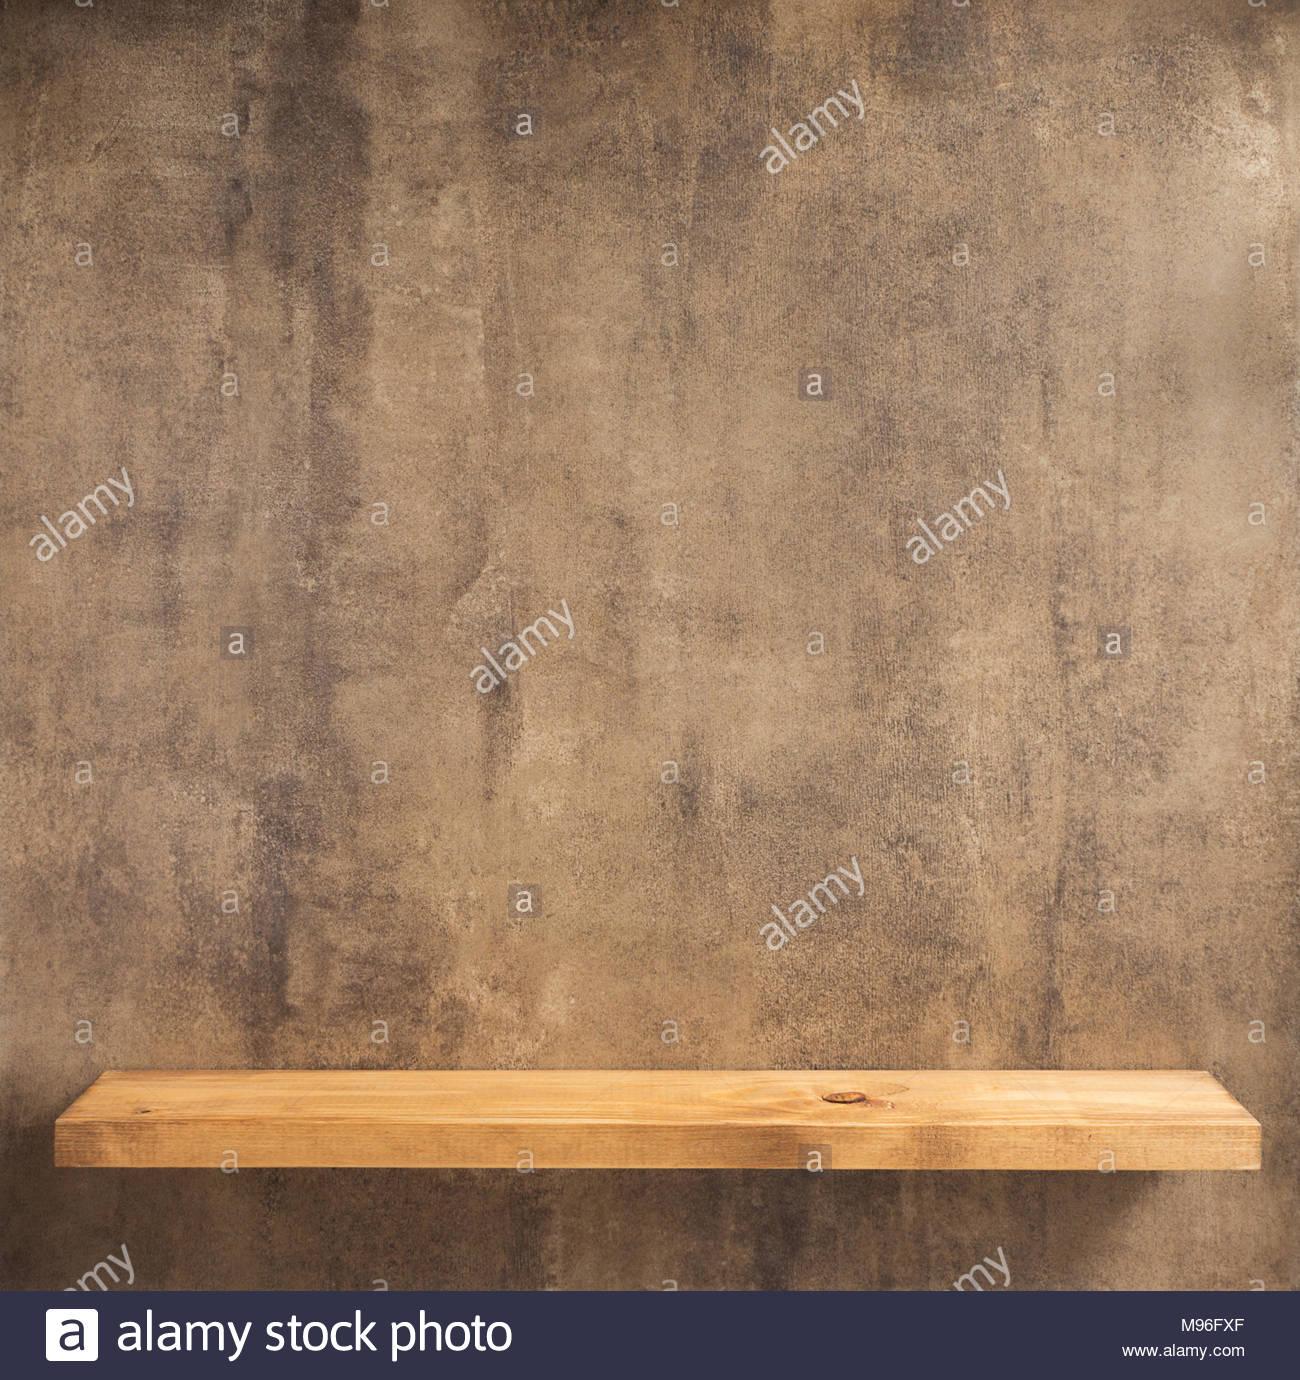 Full Size of Holzregal Wand Im Hintergrund Struktur Stockfoto Regal Wasserhahn Küche Wandanschluss Wandregal Bad Wandarmatur Wandtattoos Wandsticker Wandleuchte Wohnzimmer Holzregal Wand